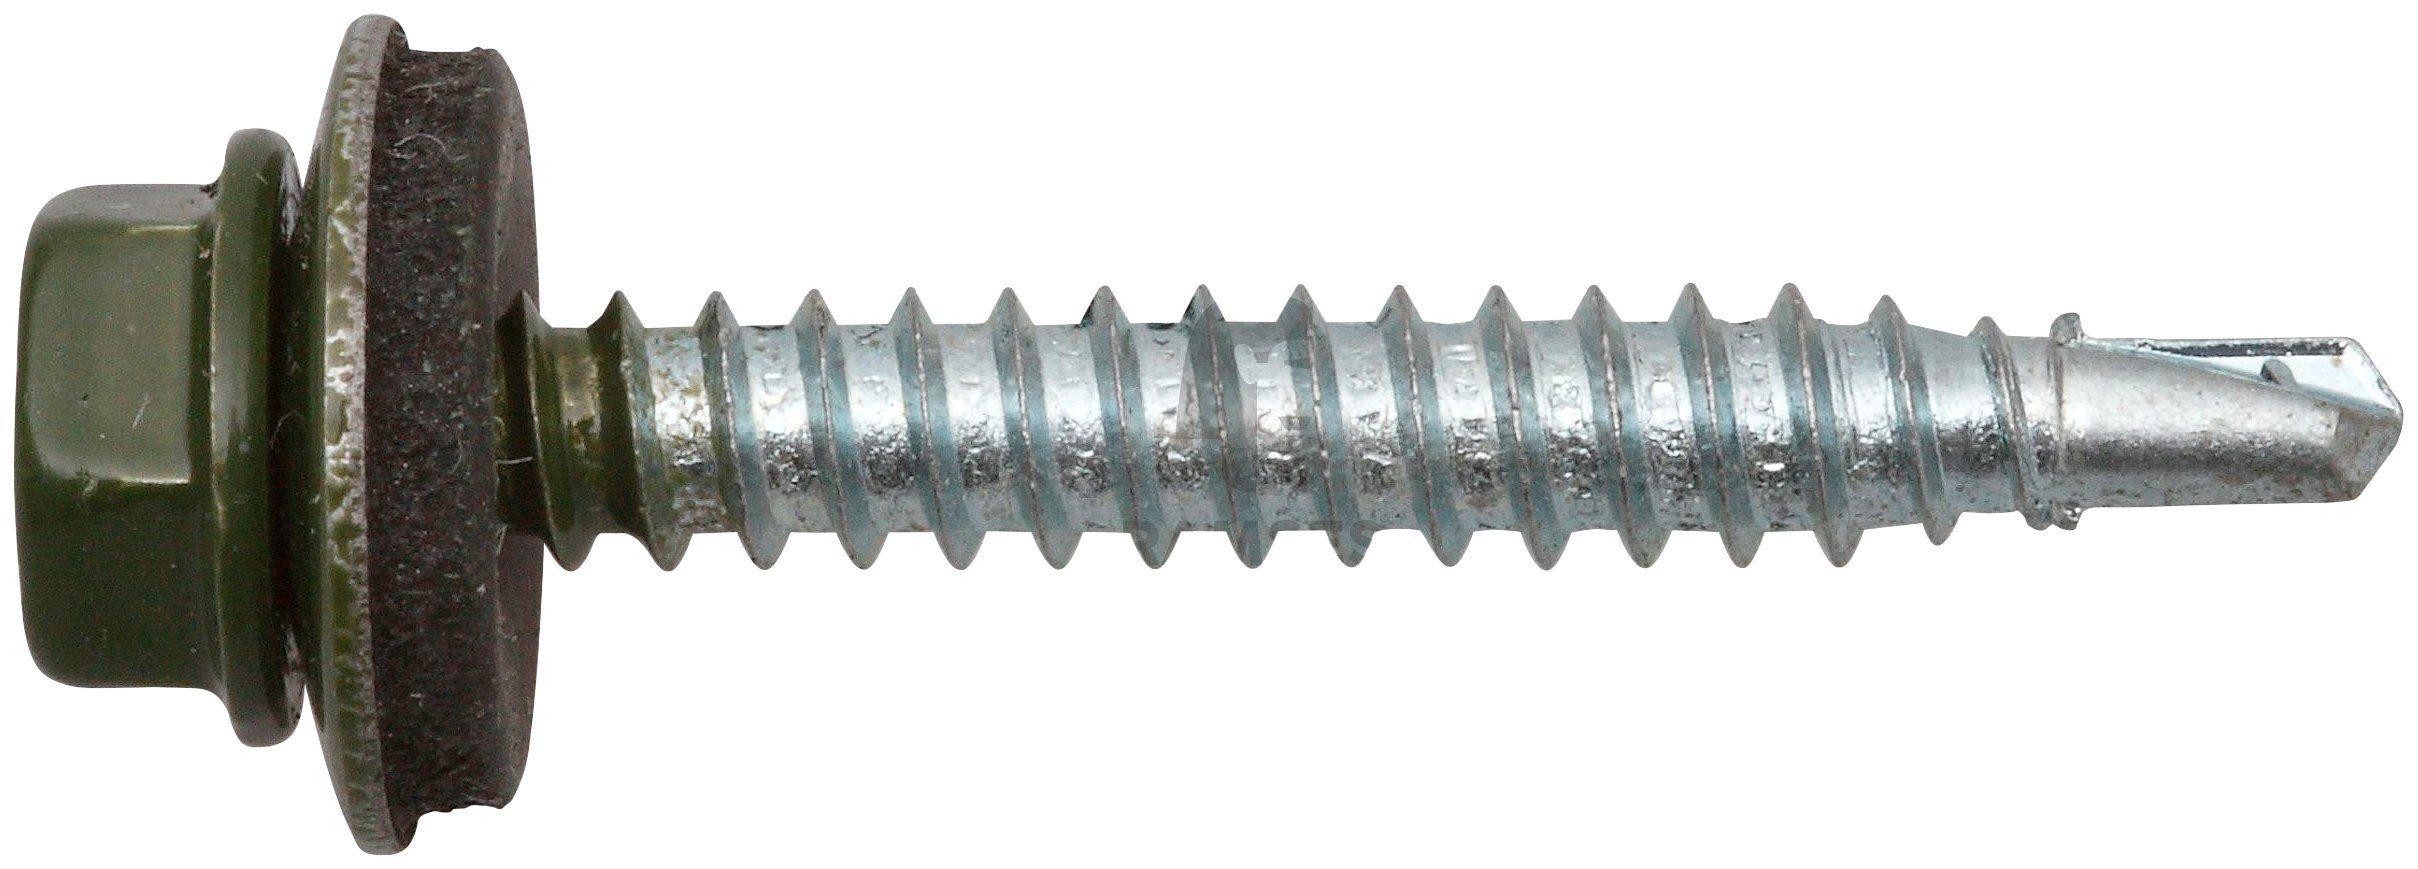 RAMSES Schrauben , Bohrschraube 4,8 x 35 mm 100 Stk.